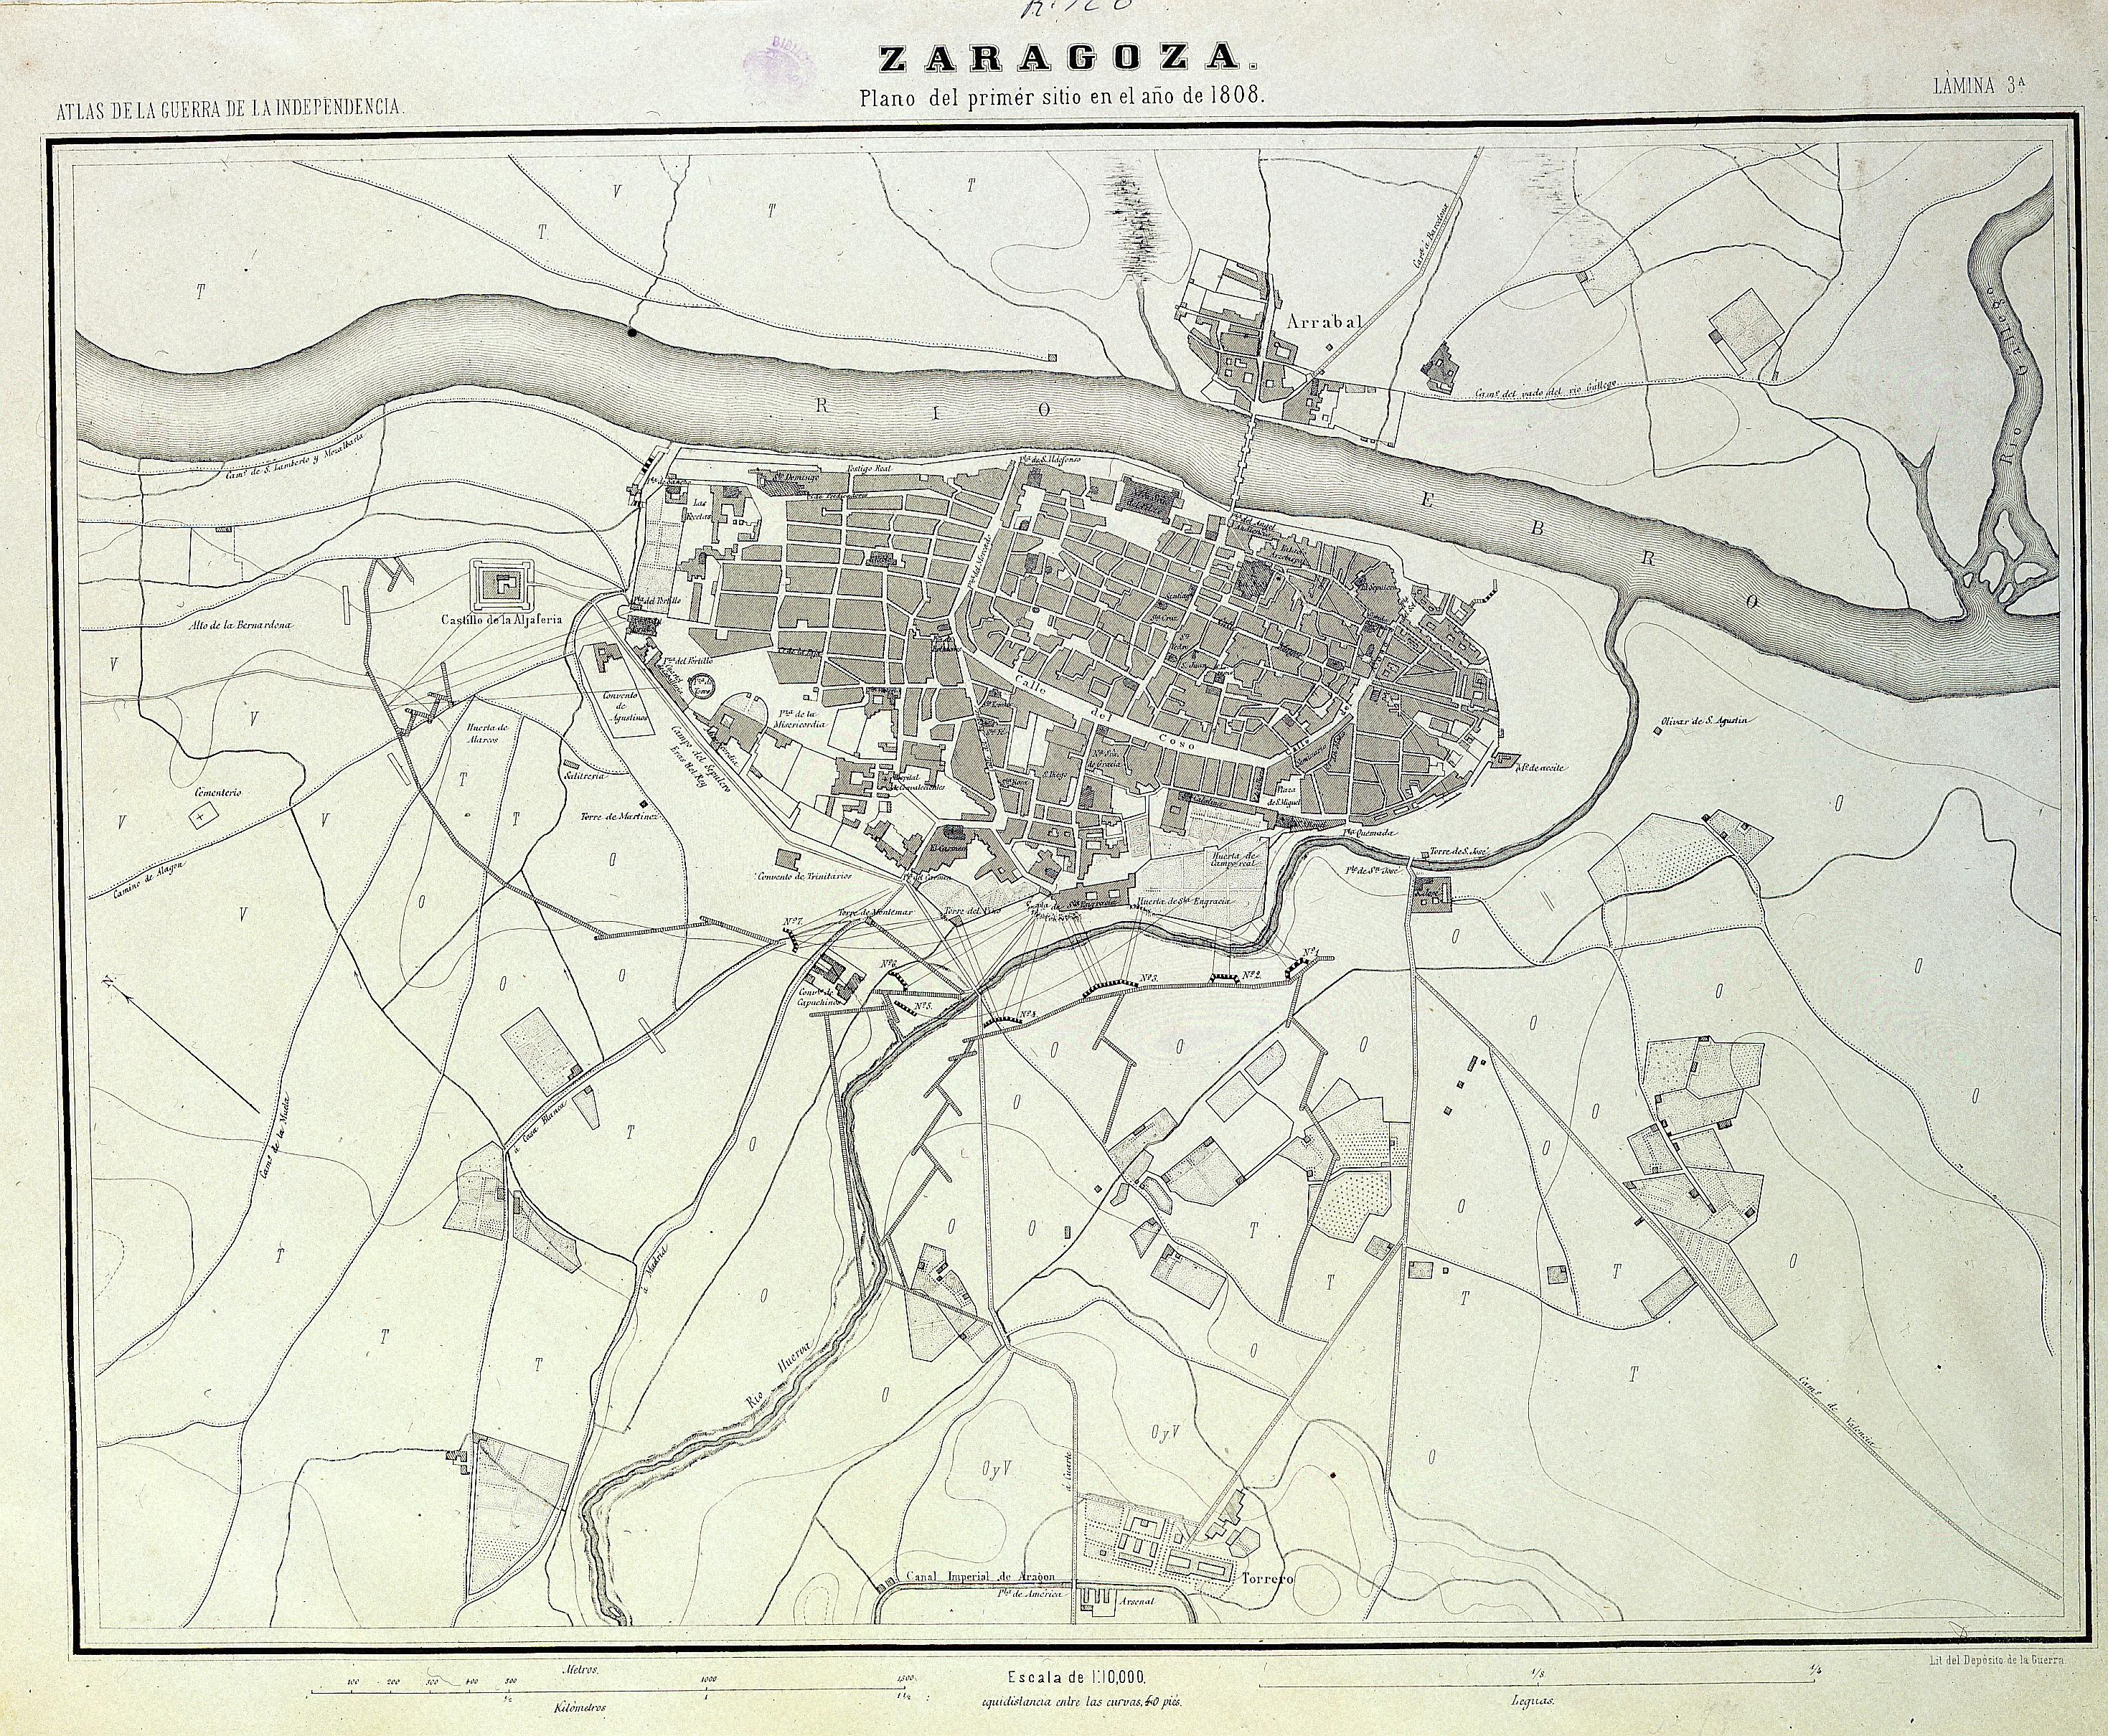 First siege of Zaragoza in 1808